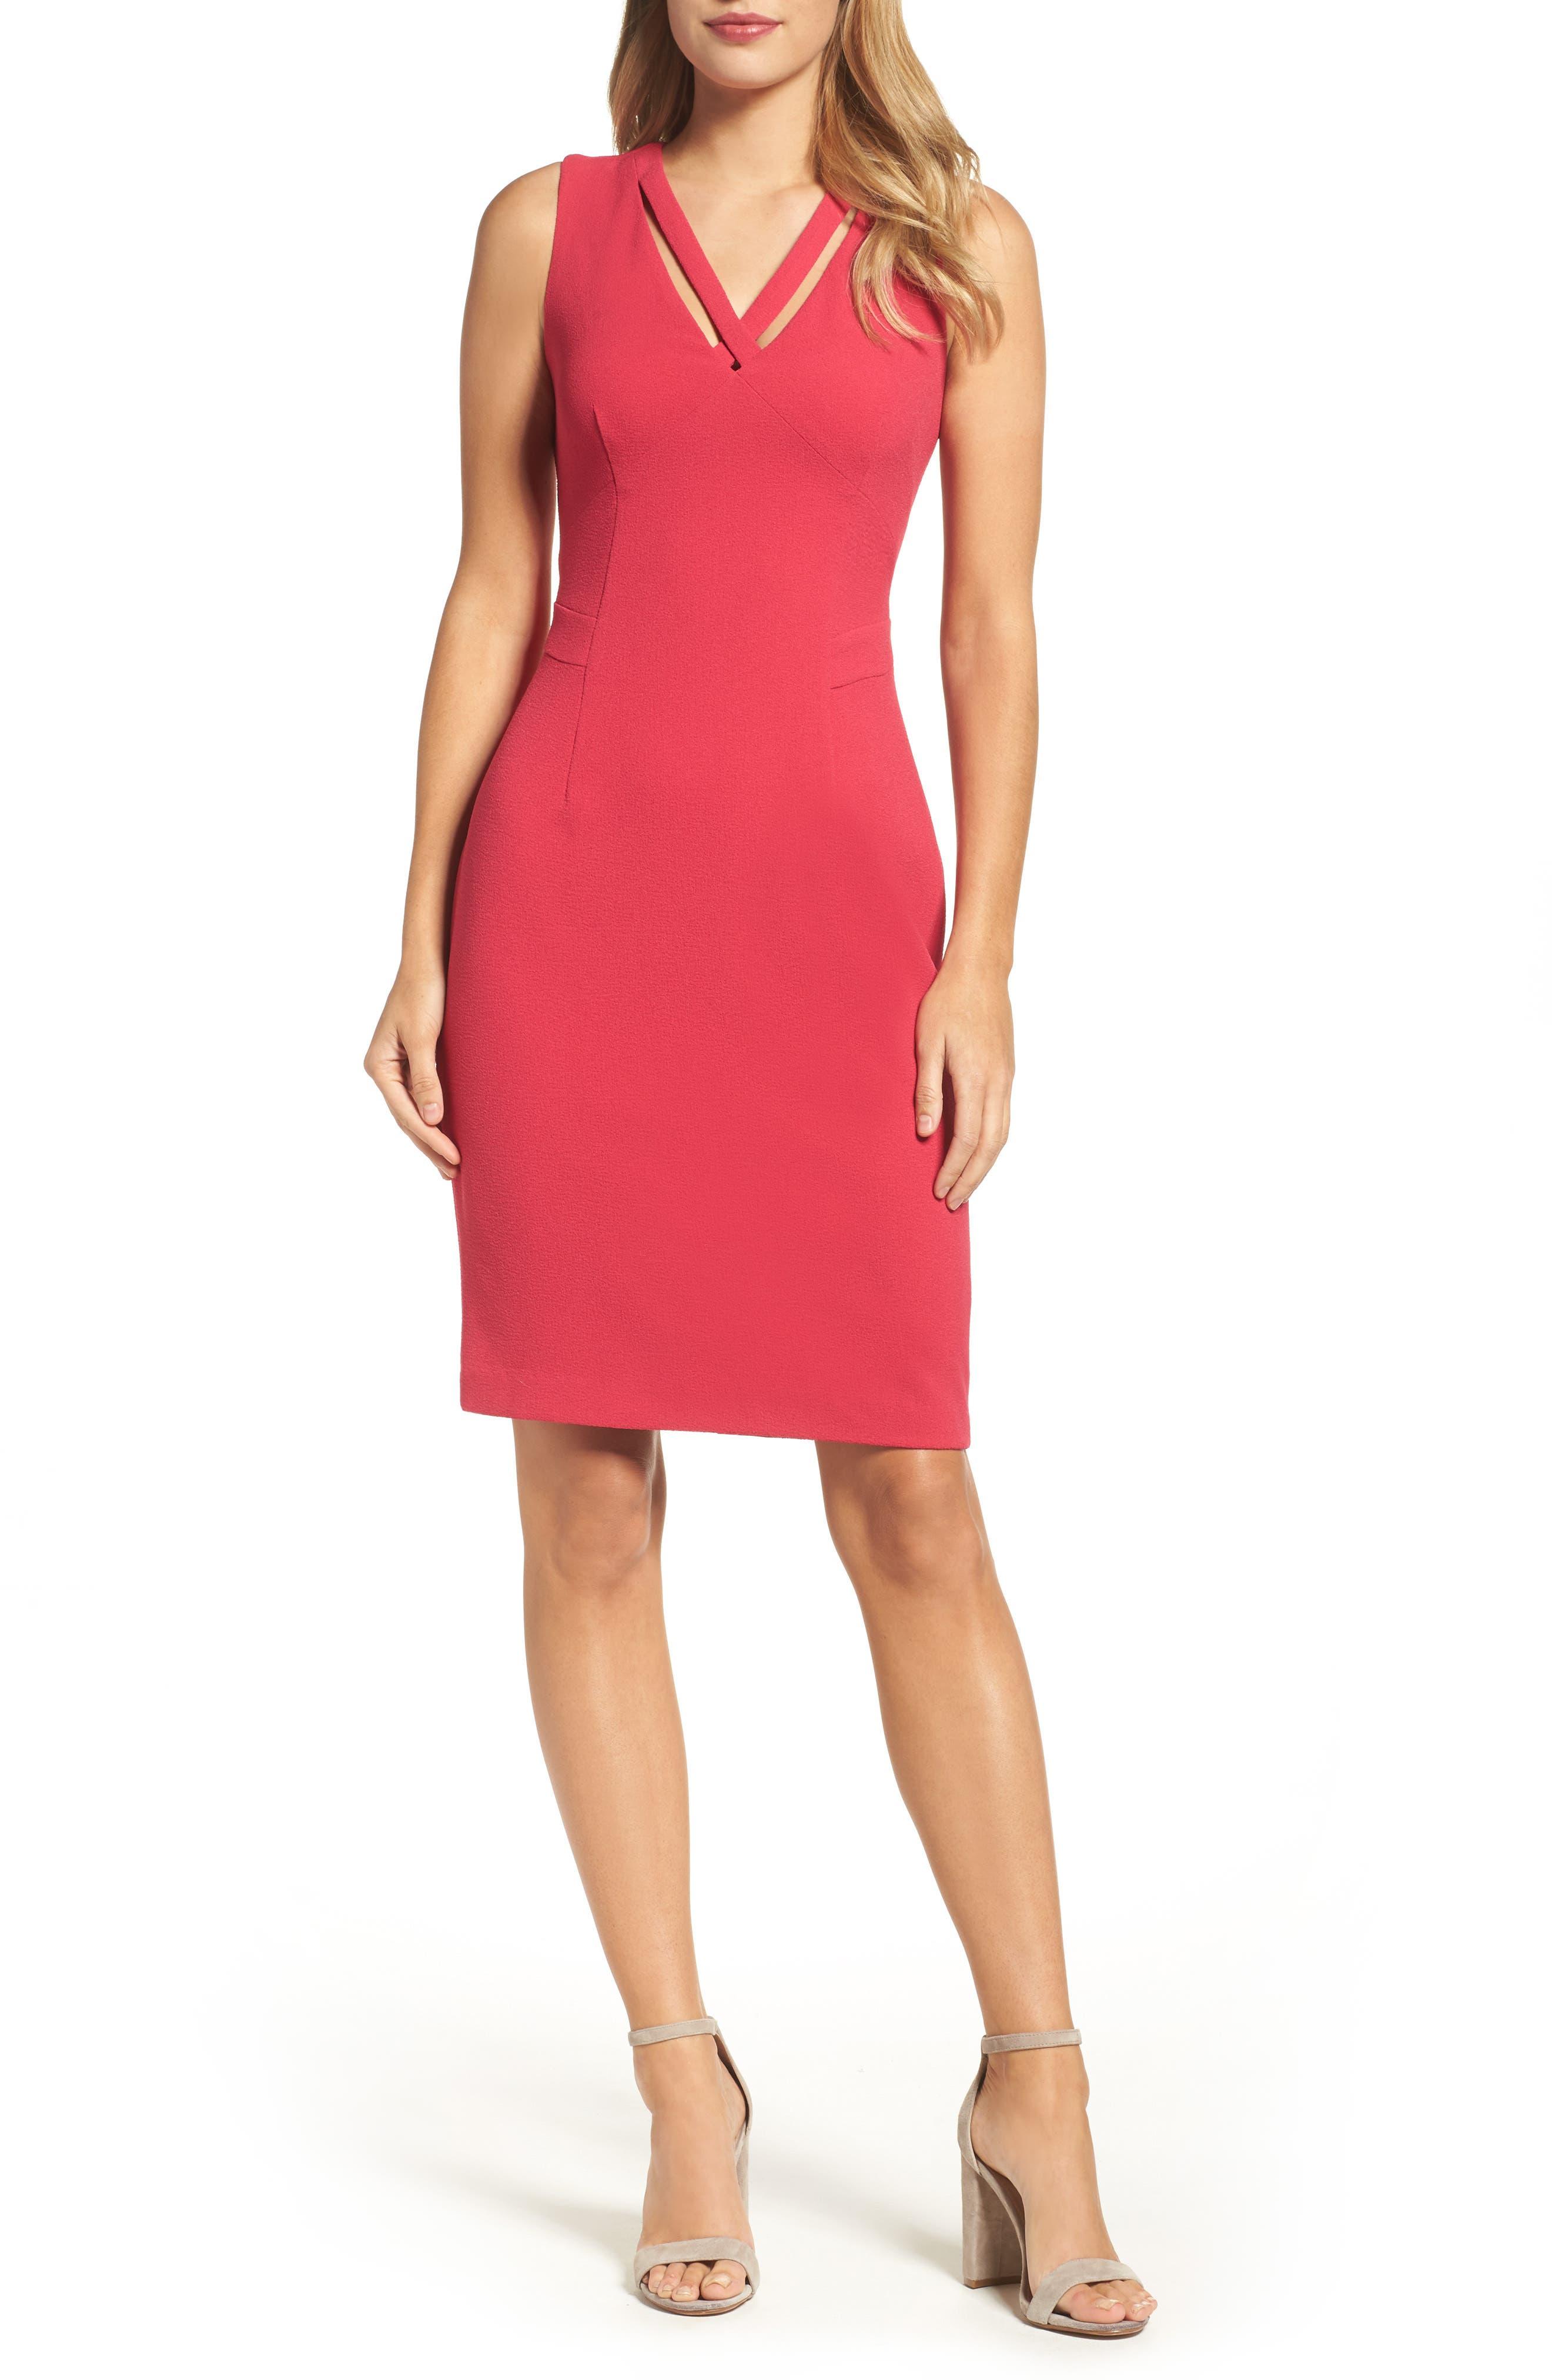 Alternate Image 1 Selected - Adrianna Papell Seamed Sheath Dress